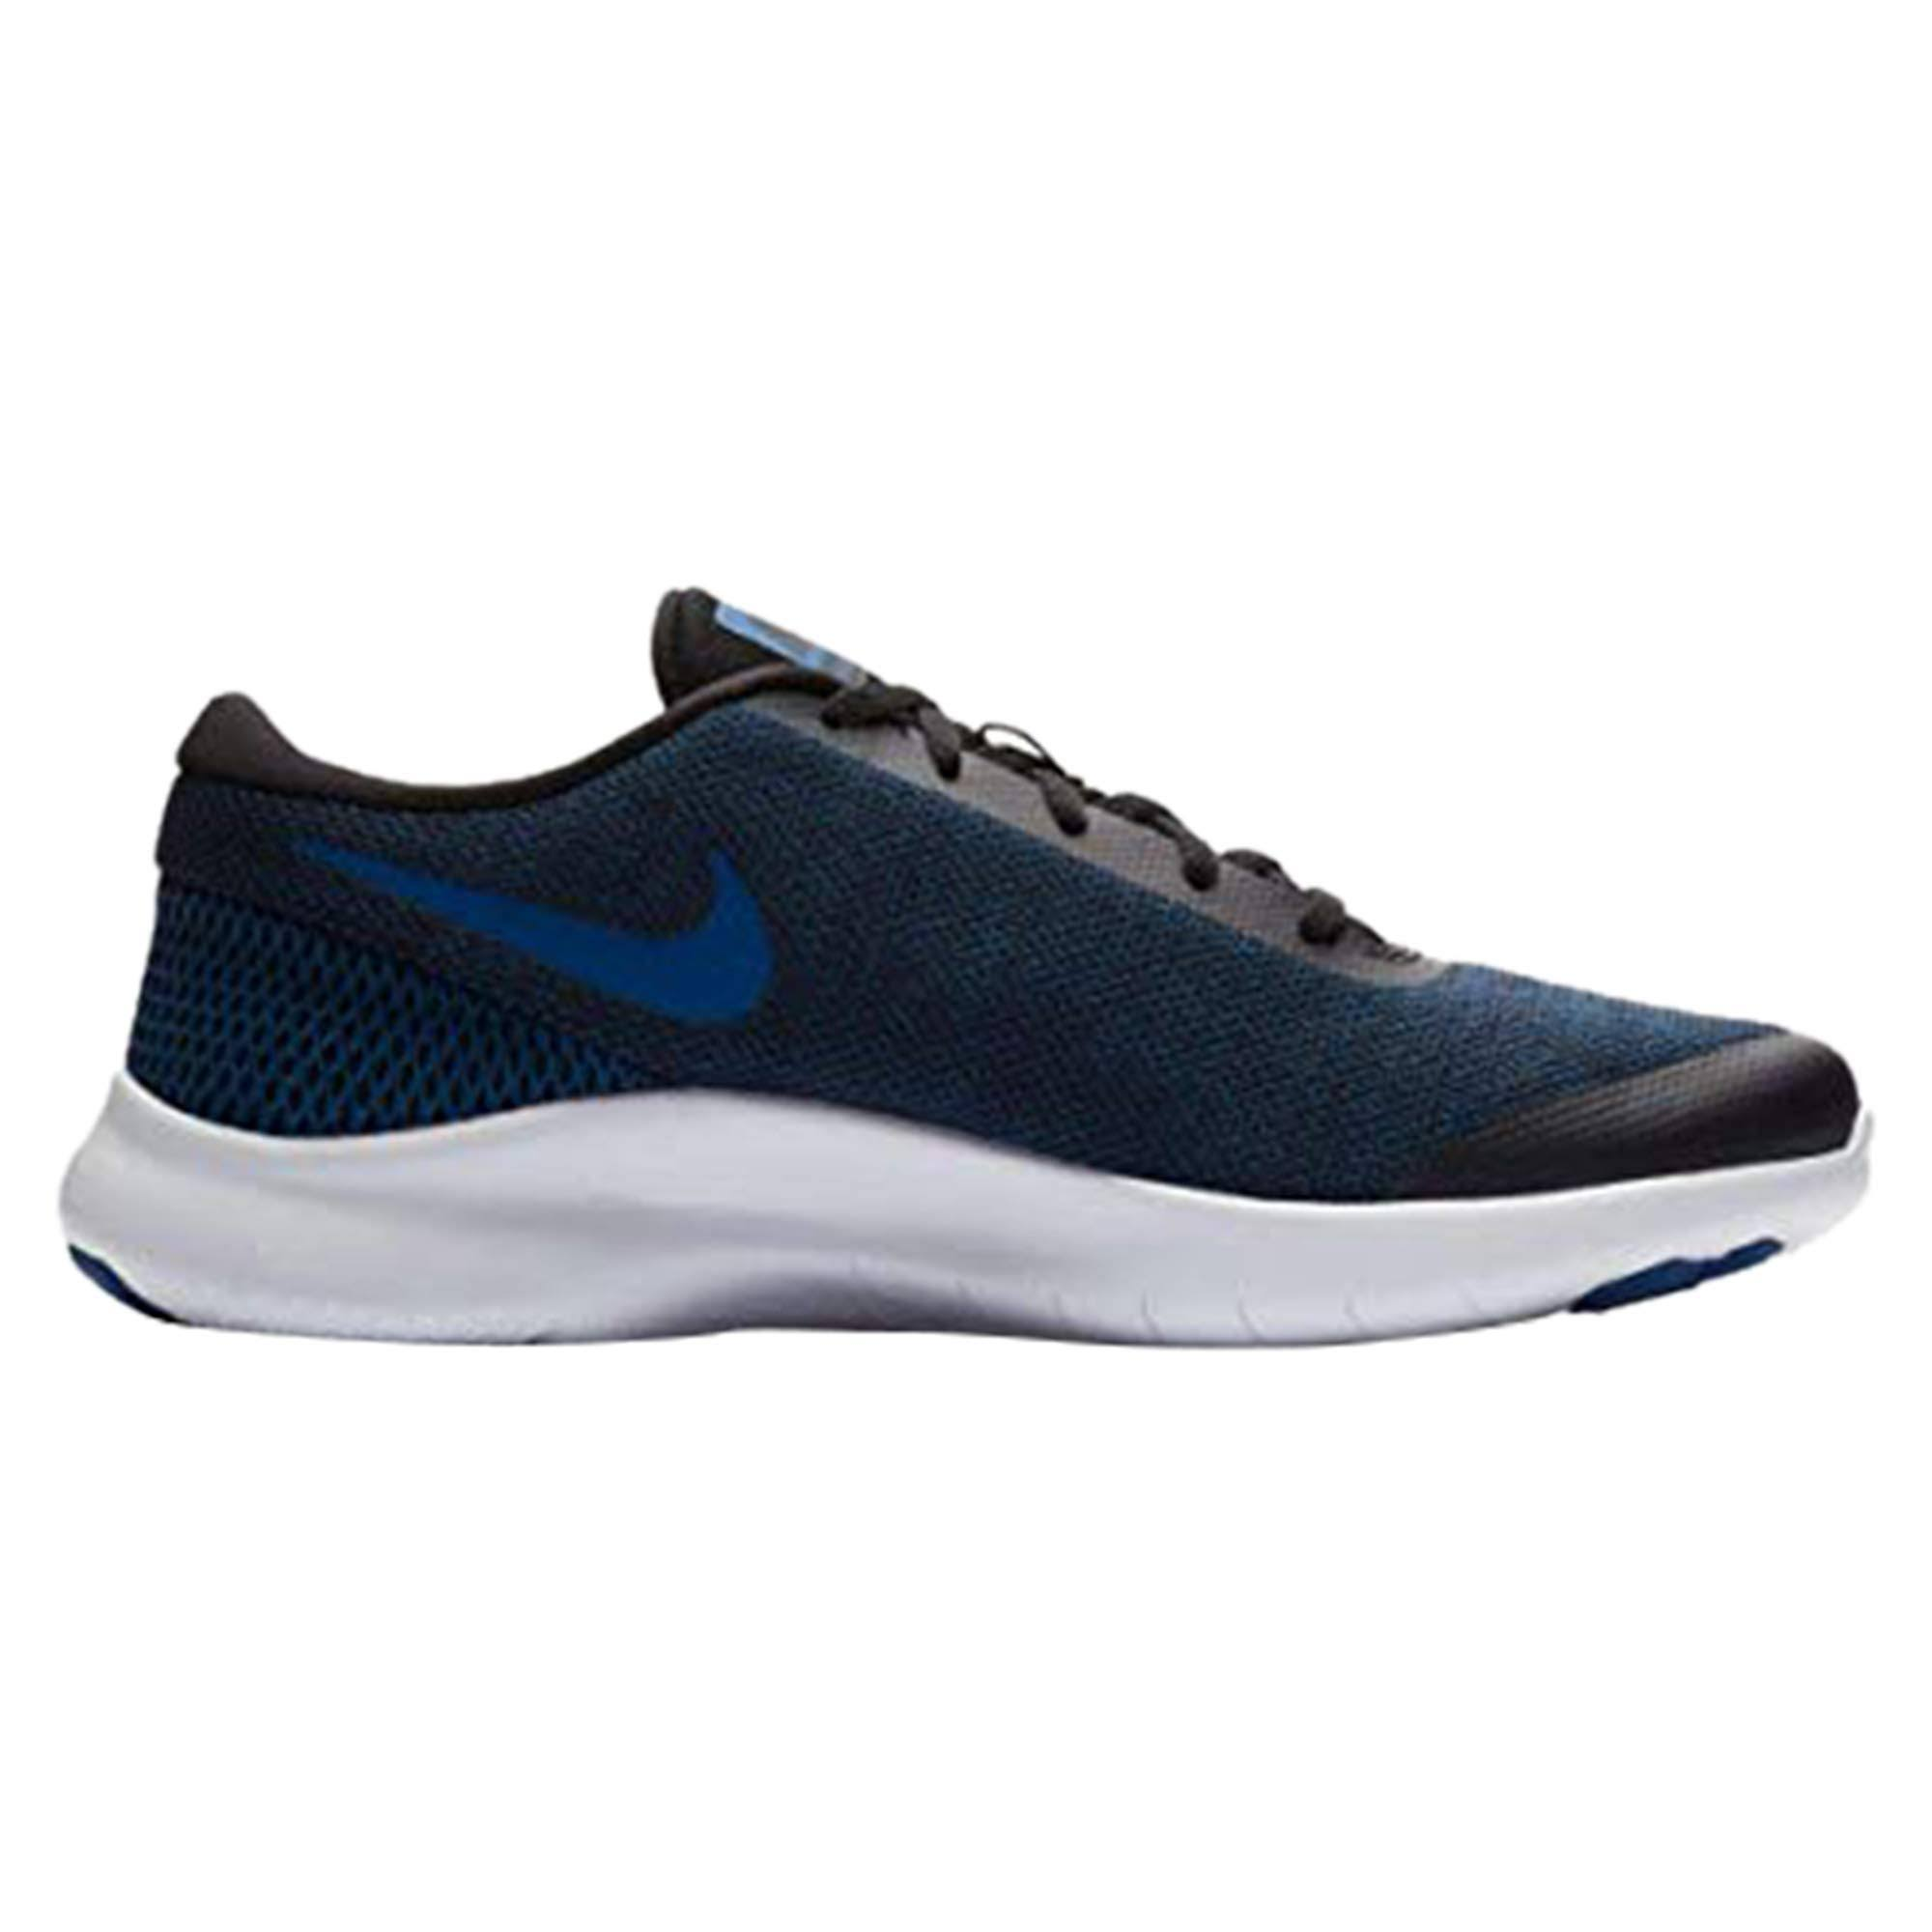 Nike Aa7405 Rn Gym 7 White Experience Mens Blk Style 003 Flex Blue rwq6TSxr